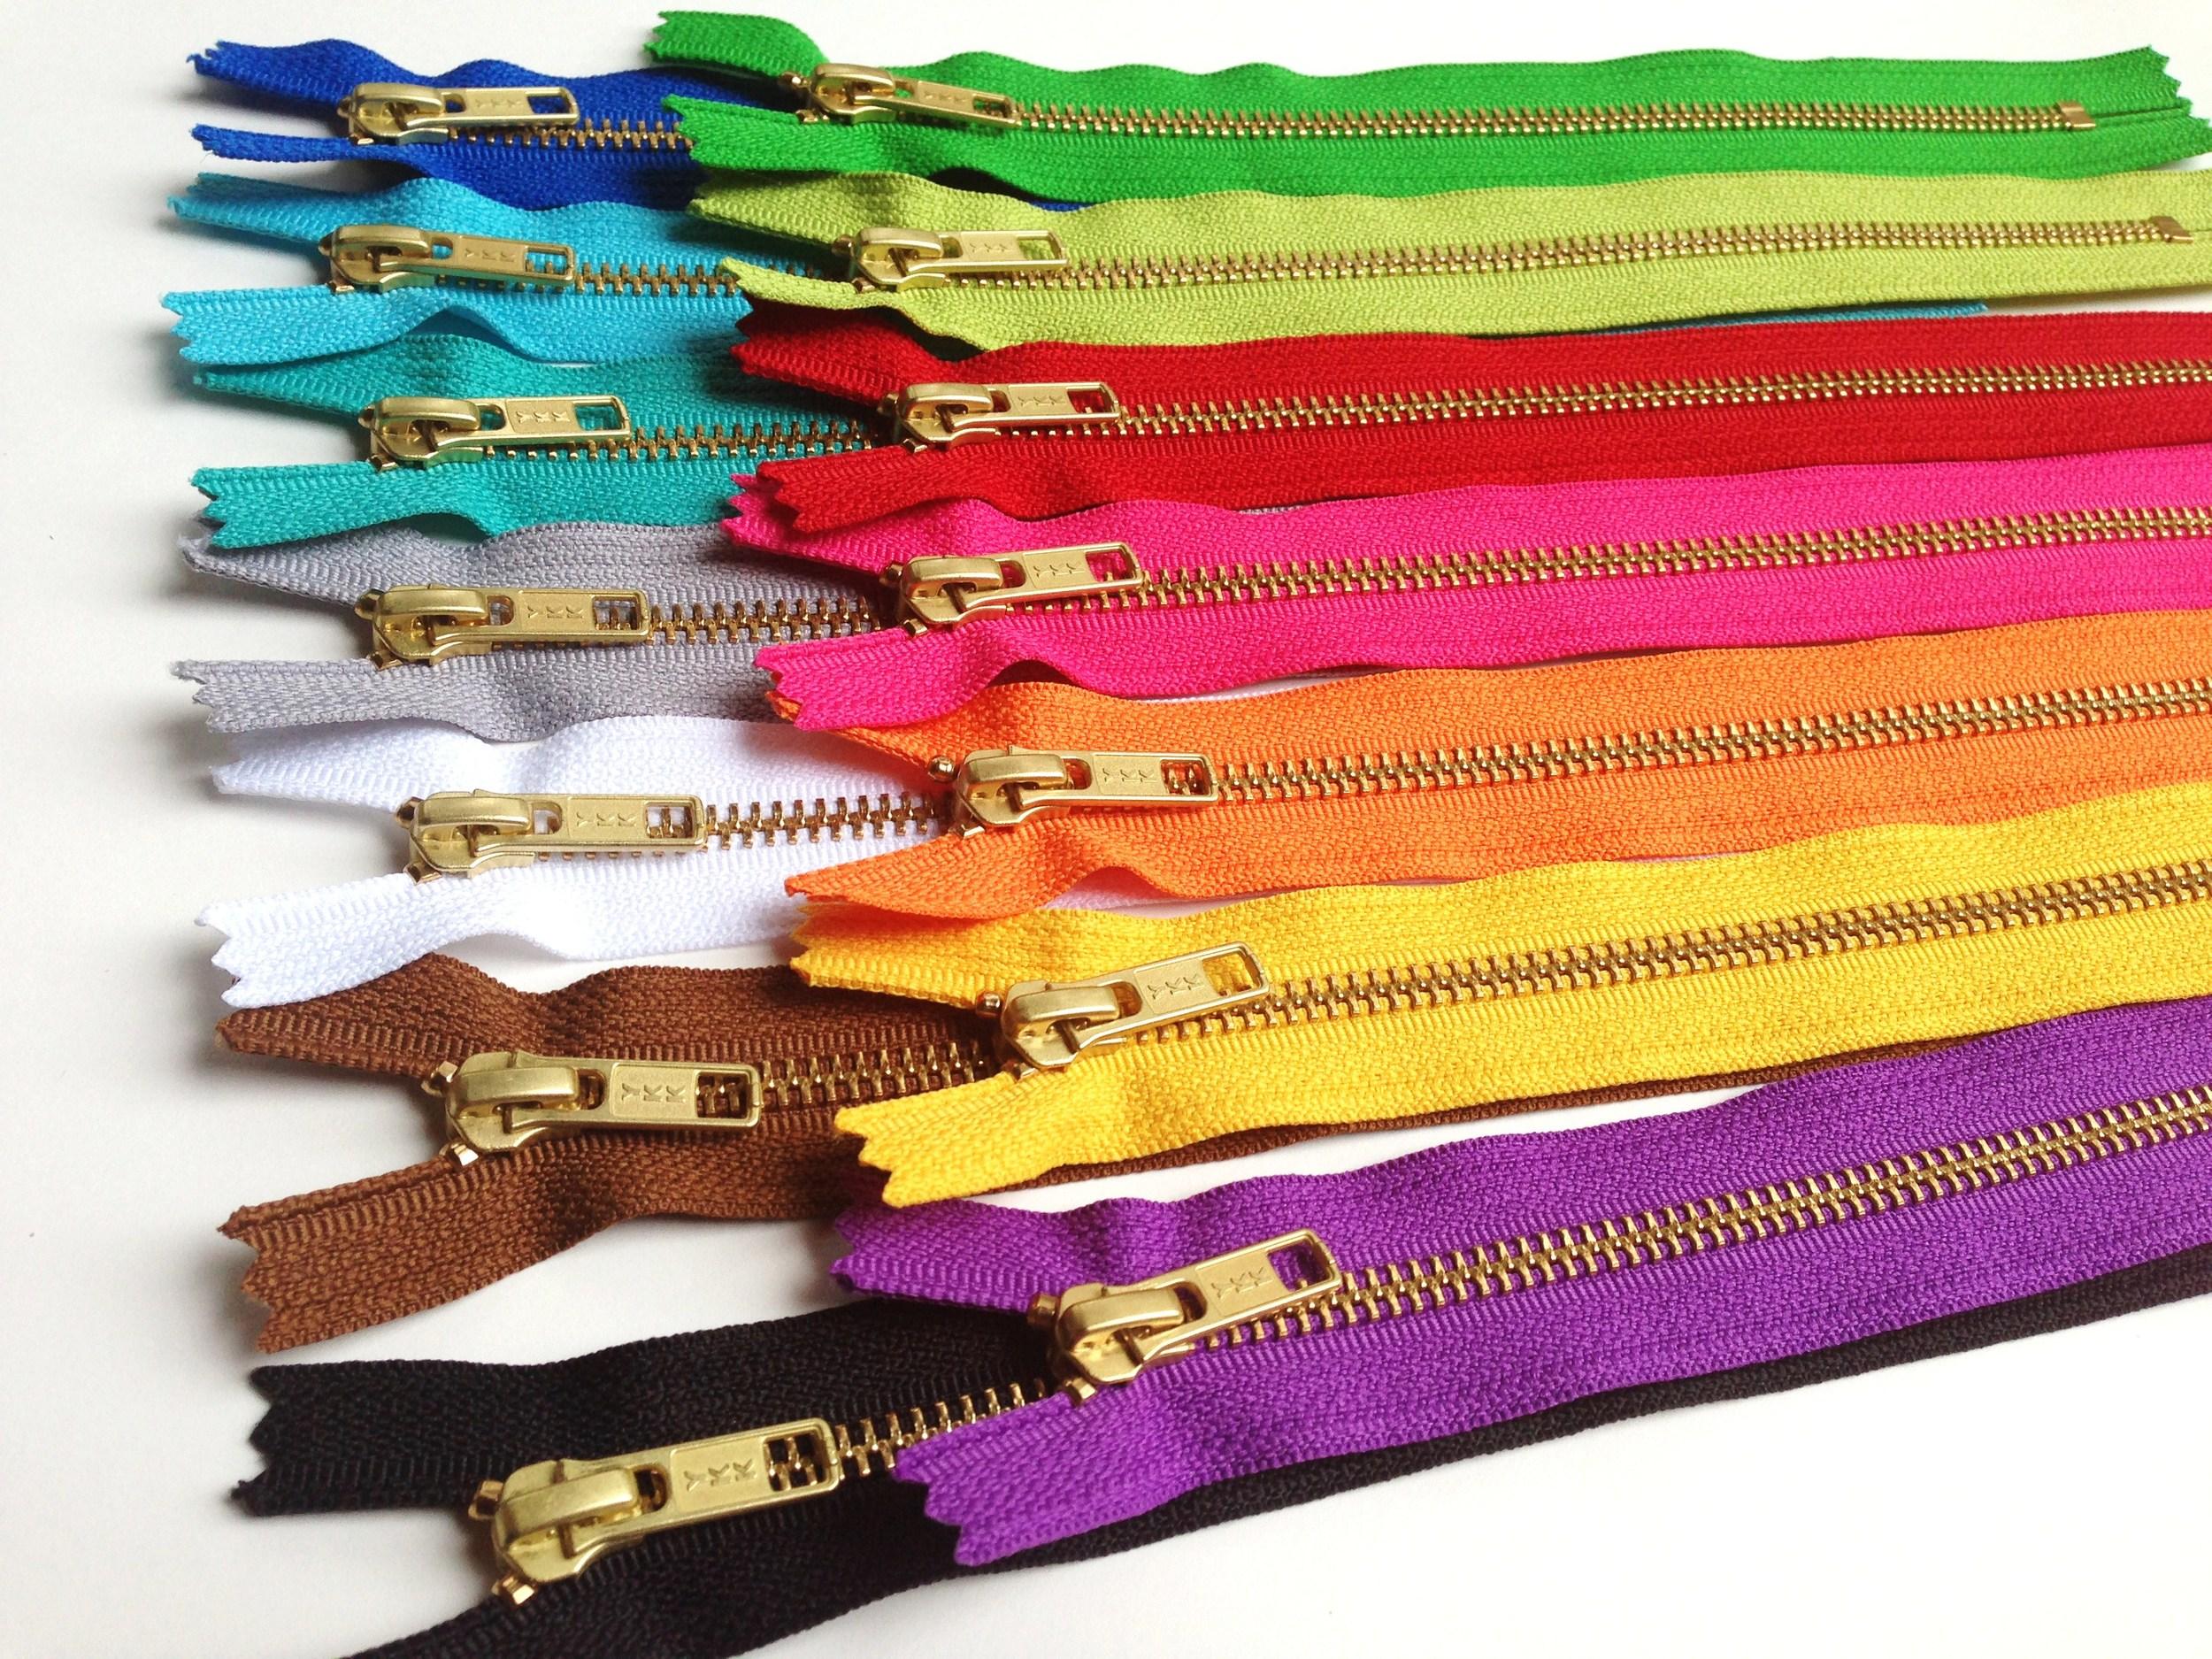 metal zippers in bulk.JPG